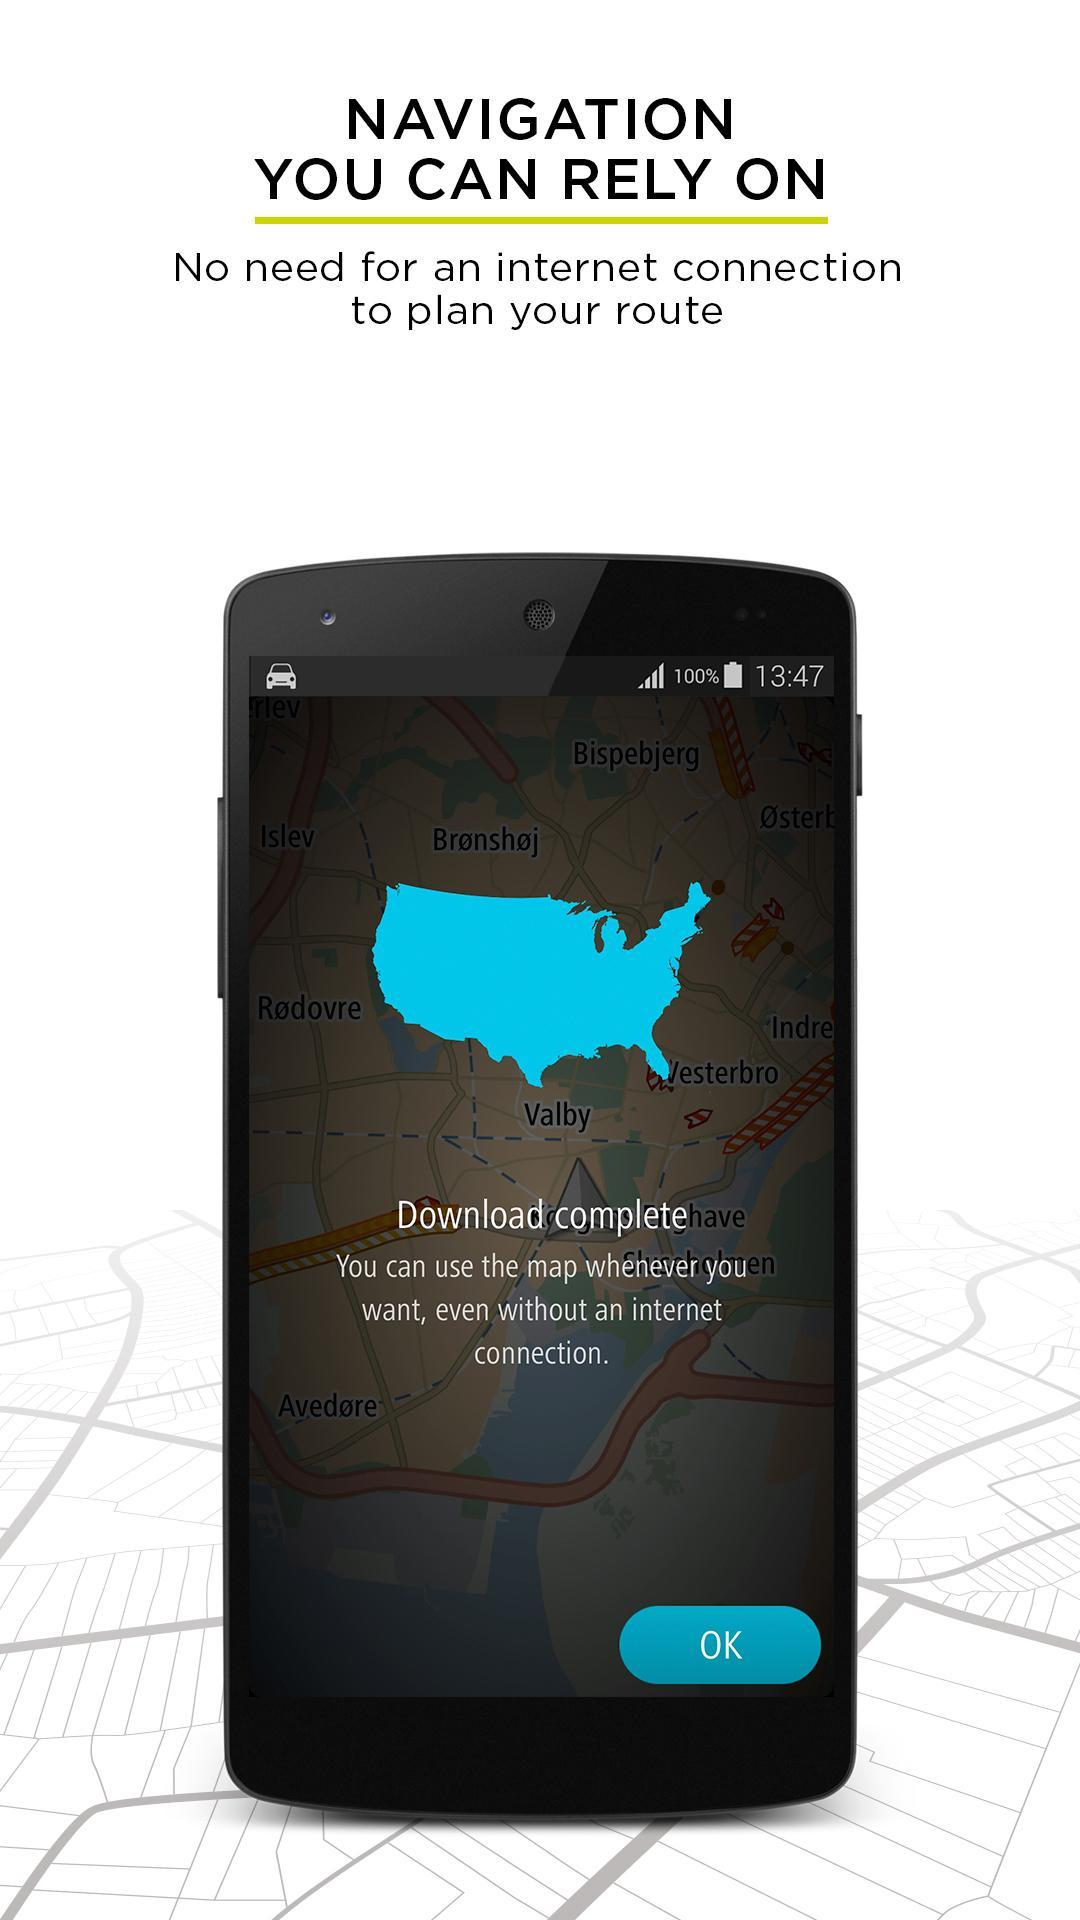 TomTom GPS Navigation - Live Traffic Alerts & Maps 2.0.4 Screenshot 6